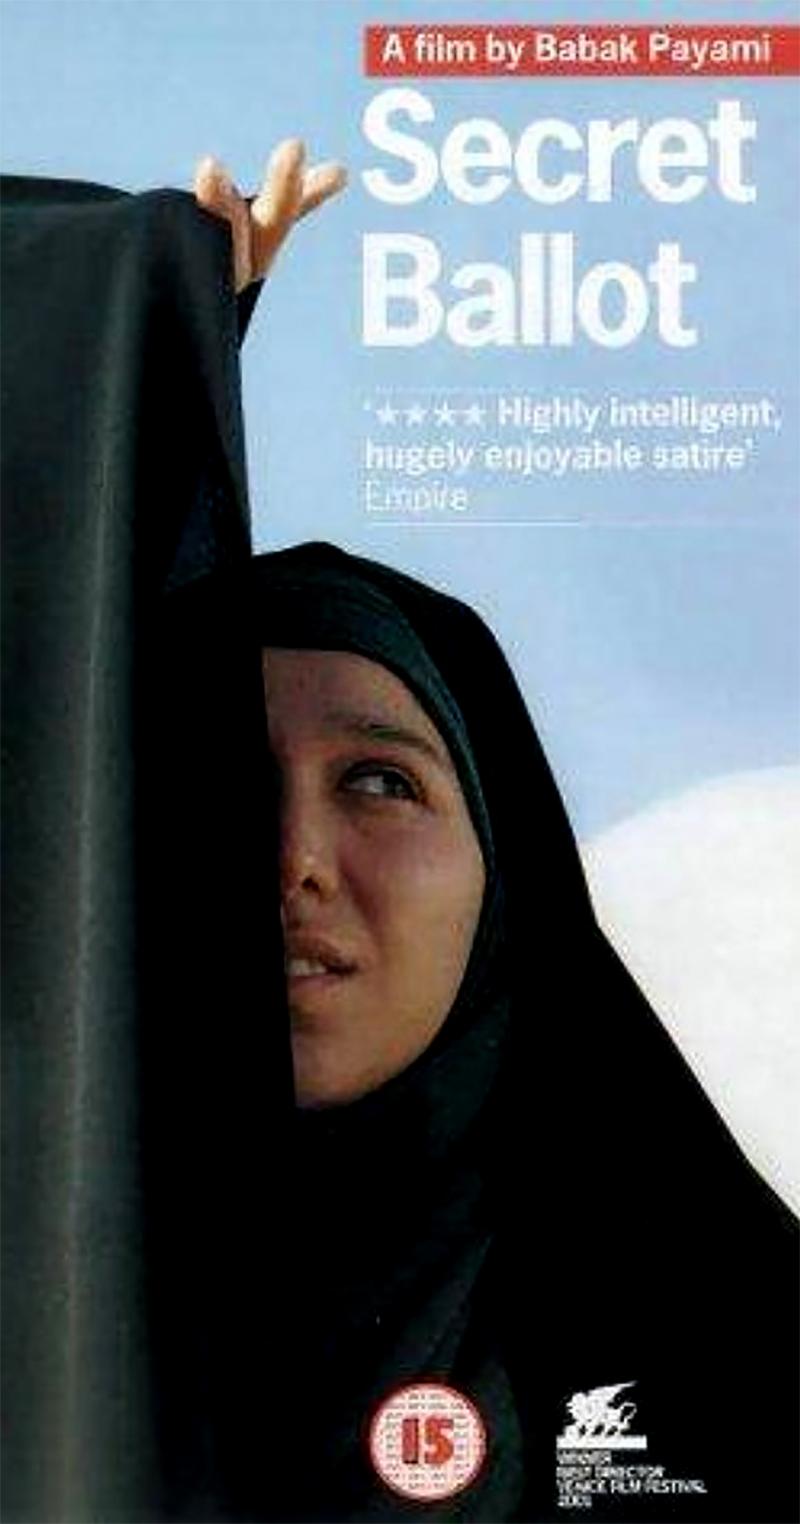 iranian film secret ballot poster